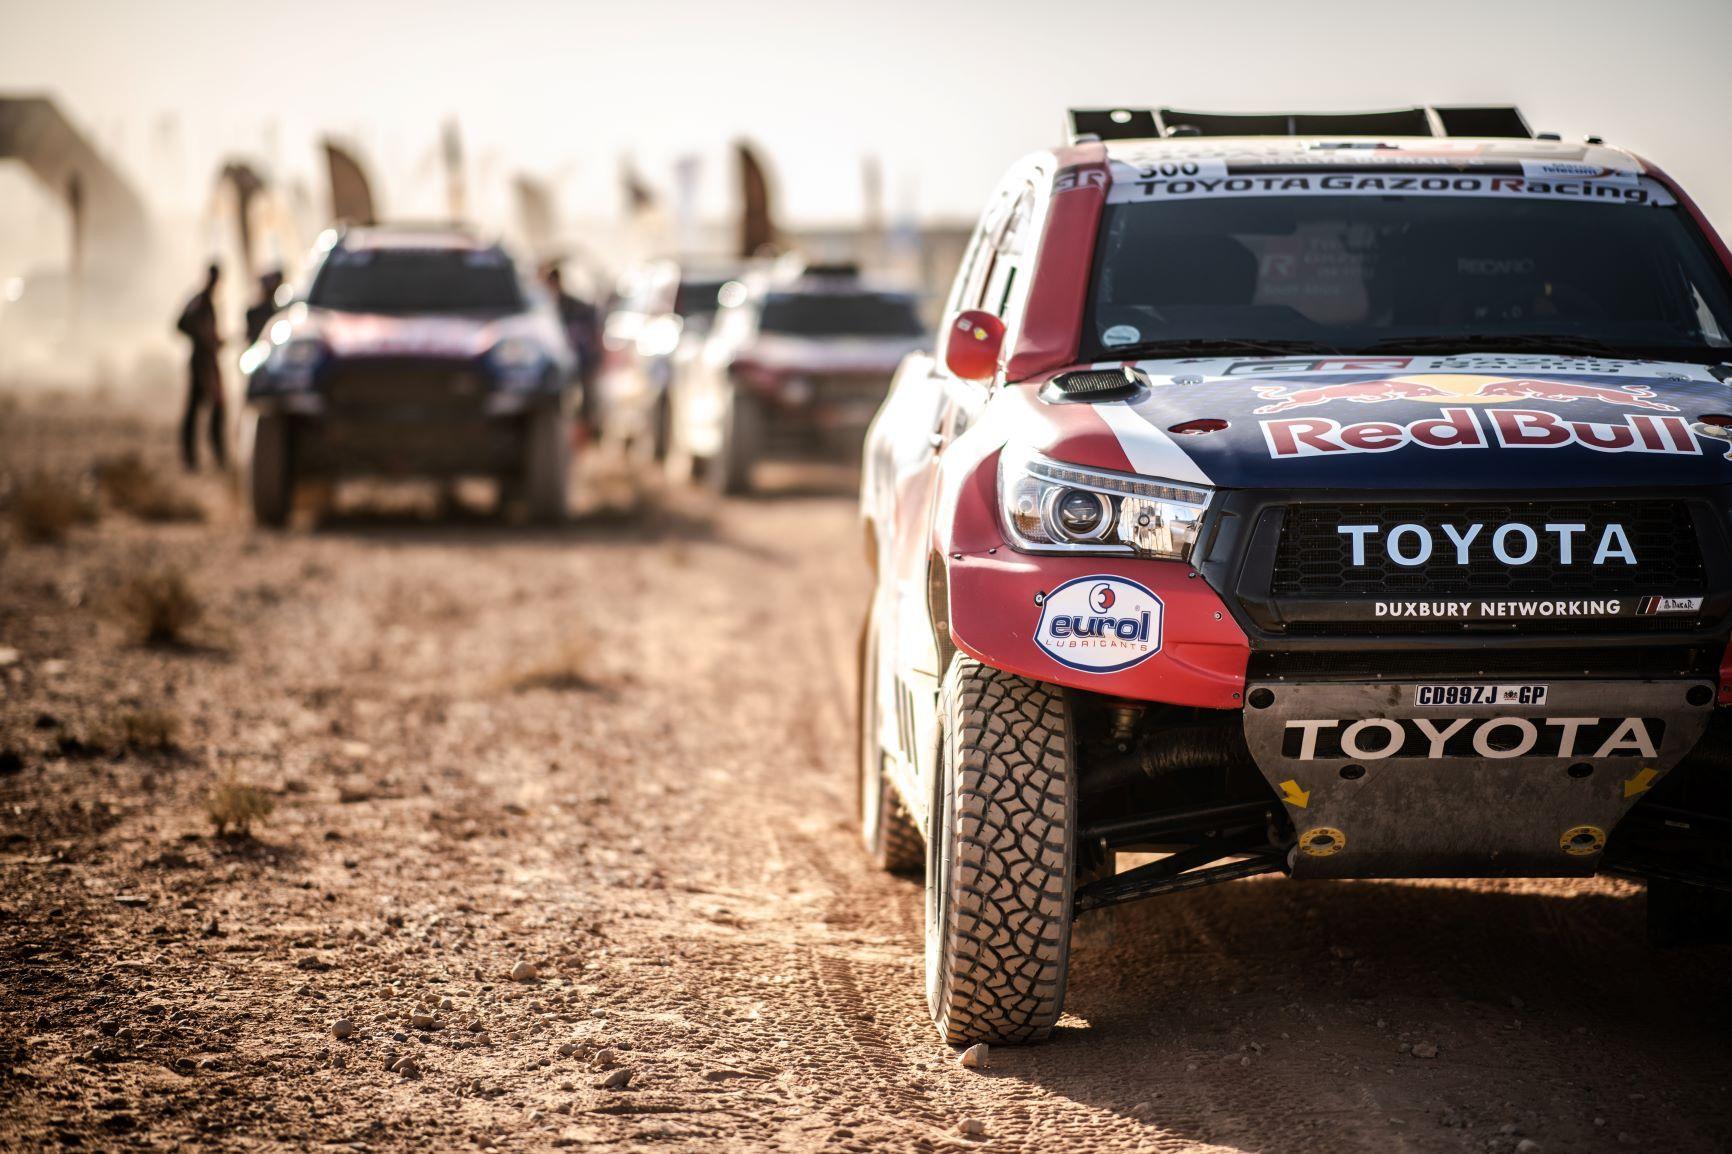 2020 Toyota Dakar Price Check More At Http Dailymaza Me 2020 Toyota Dakar Price Di 2020